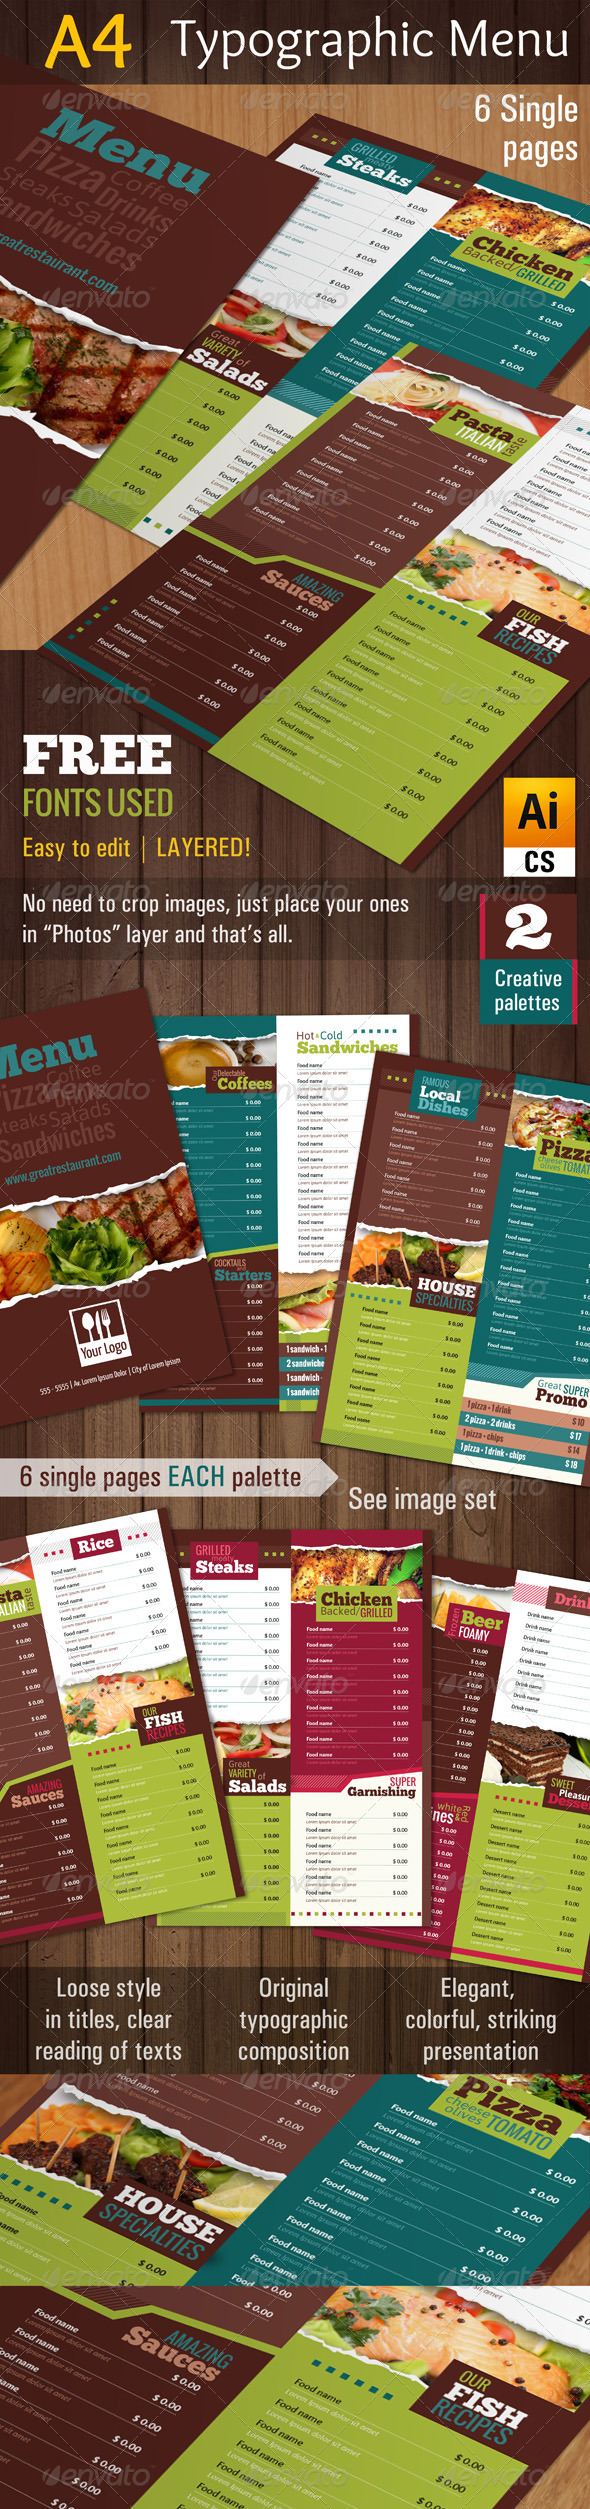 GraphicRiver A4 Typographic Menu 4765673